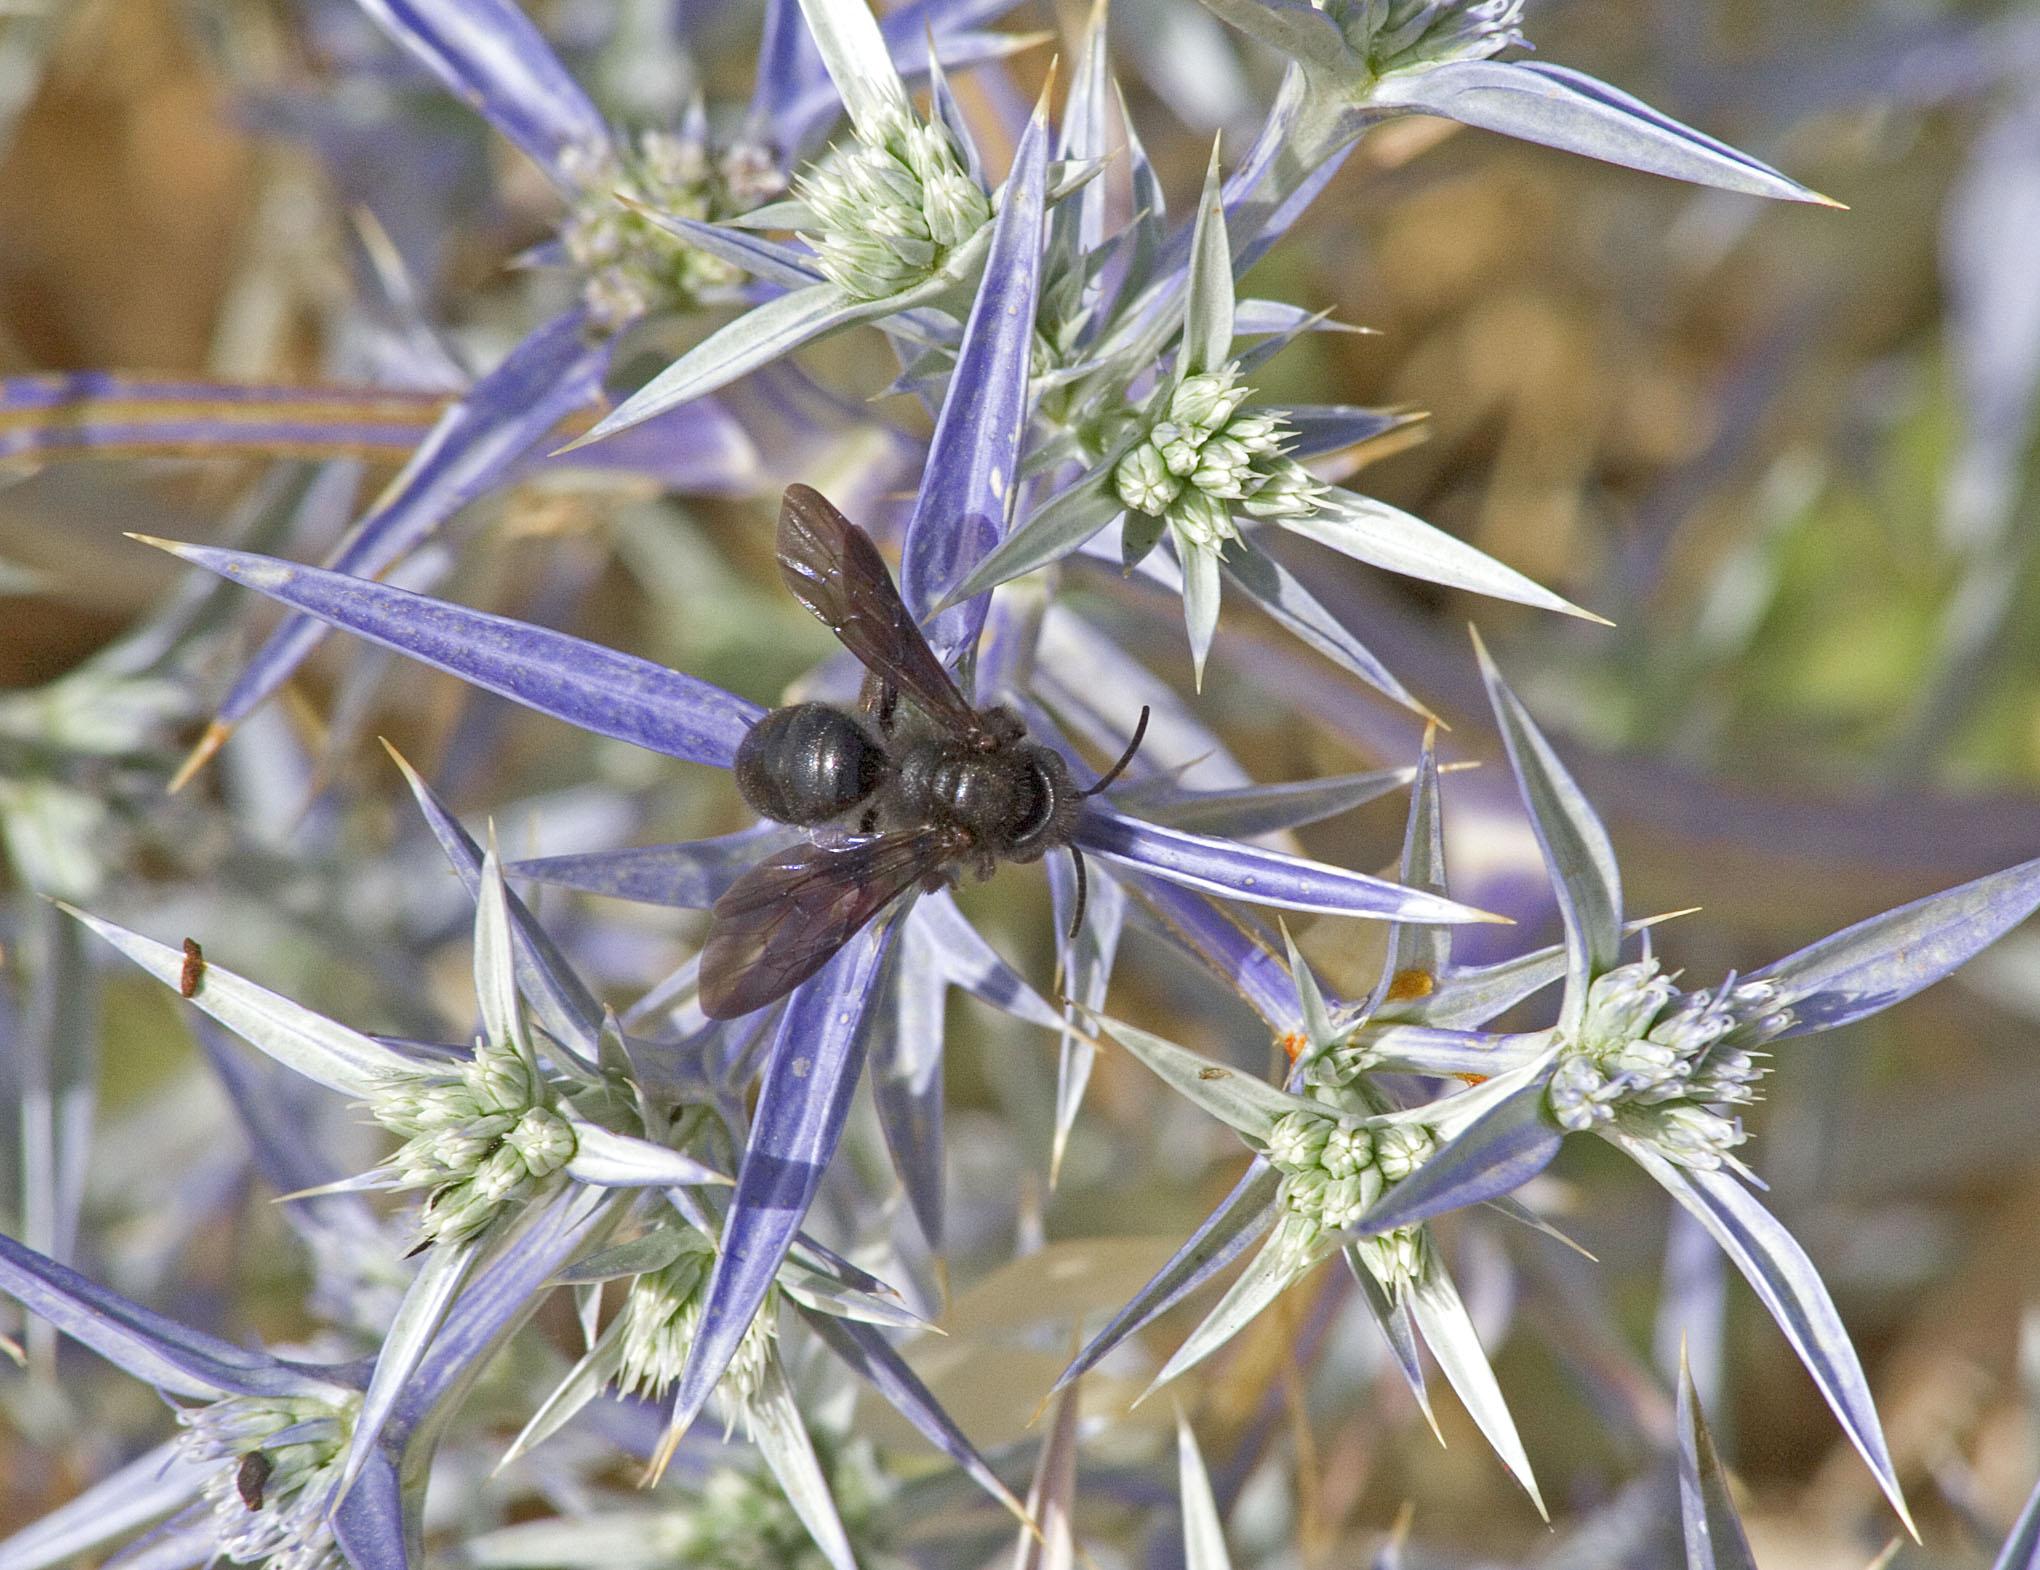 Wasps - 4